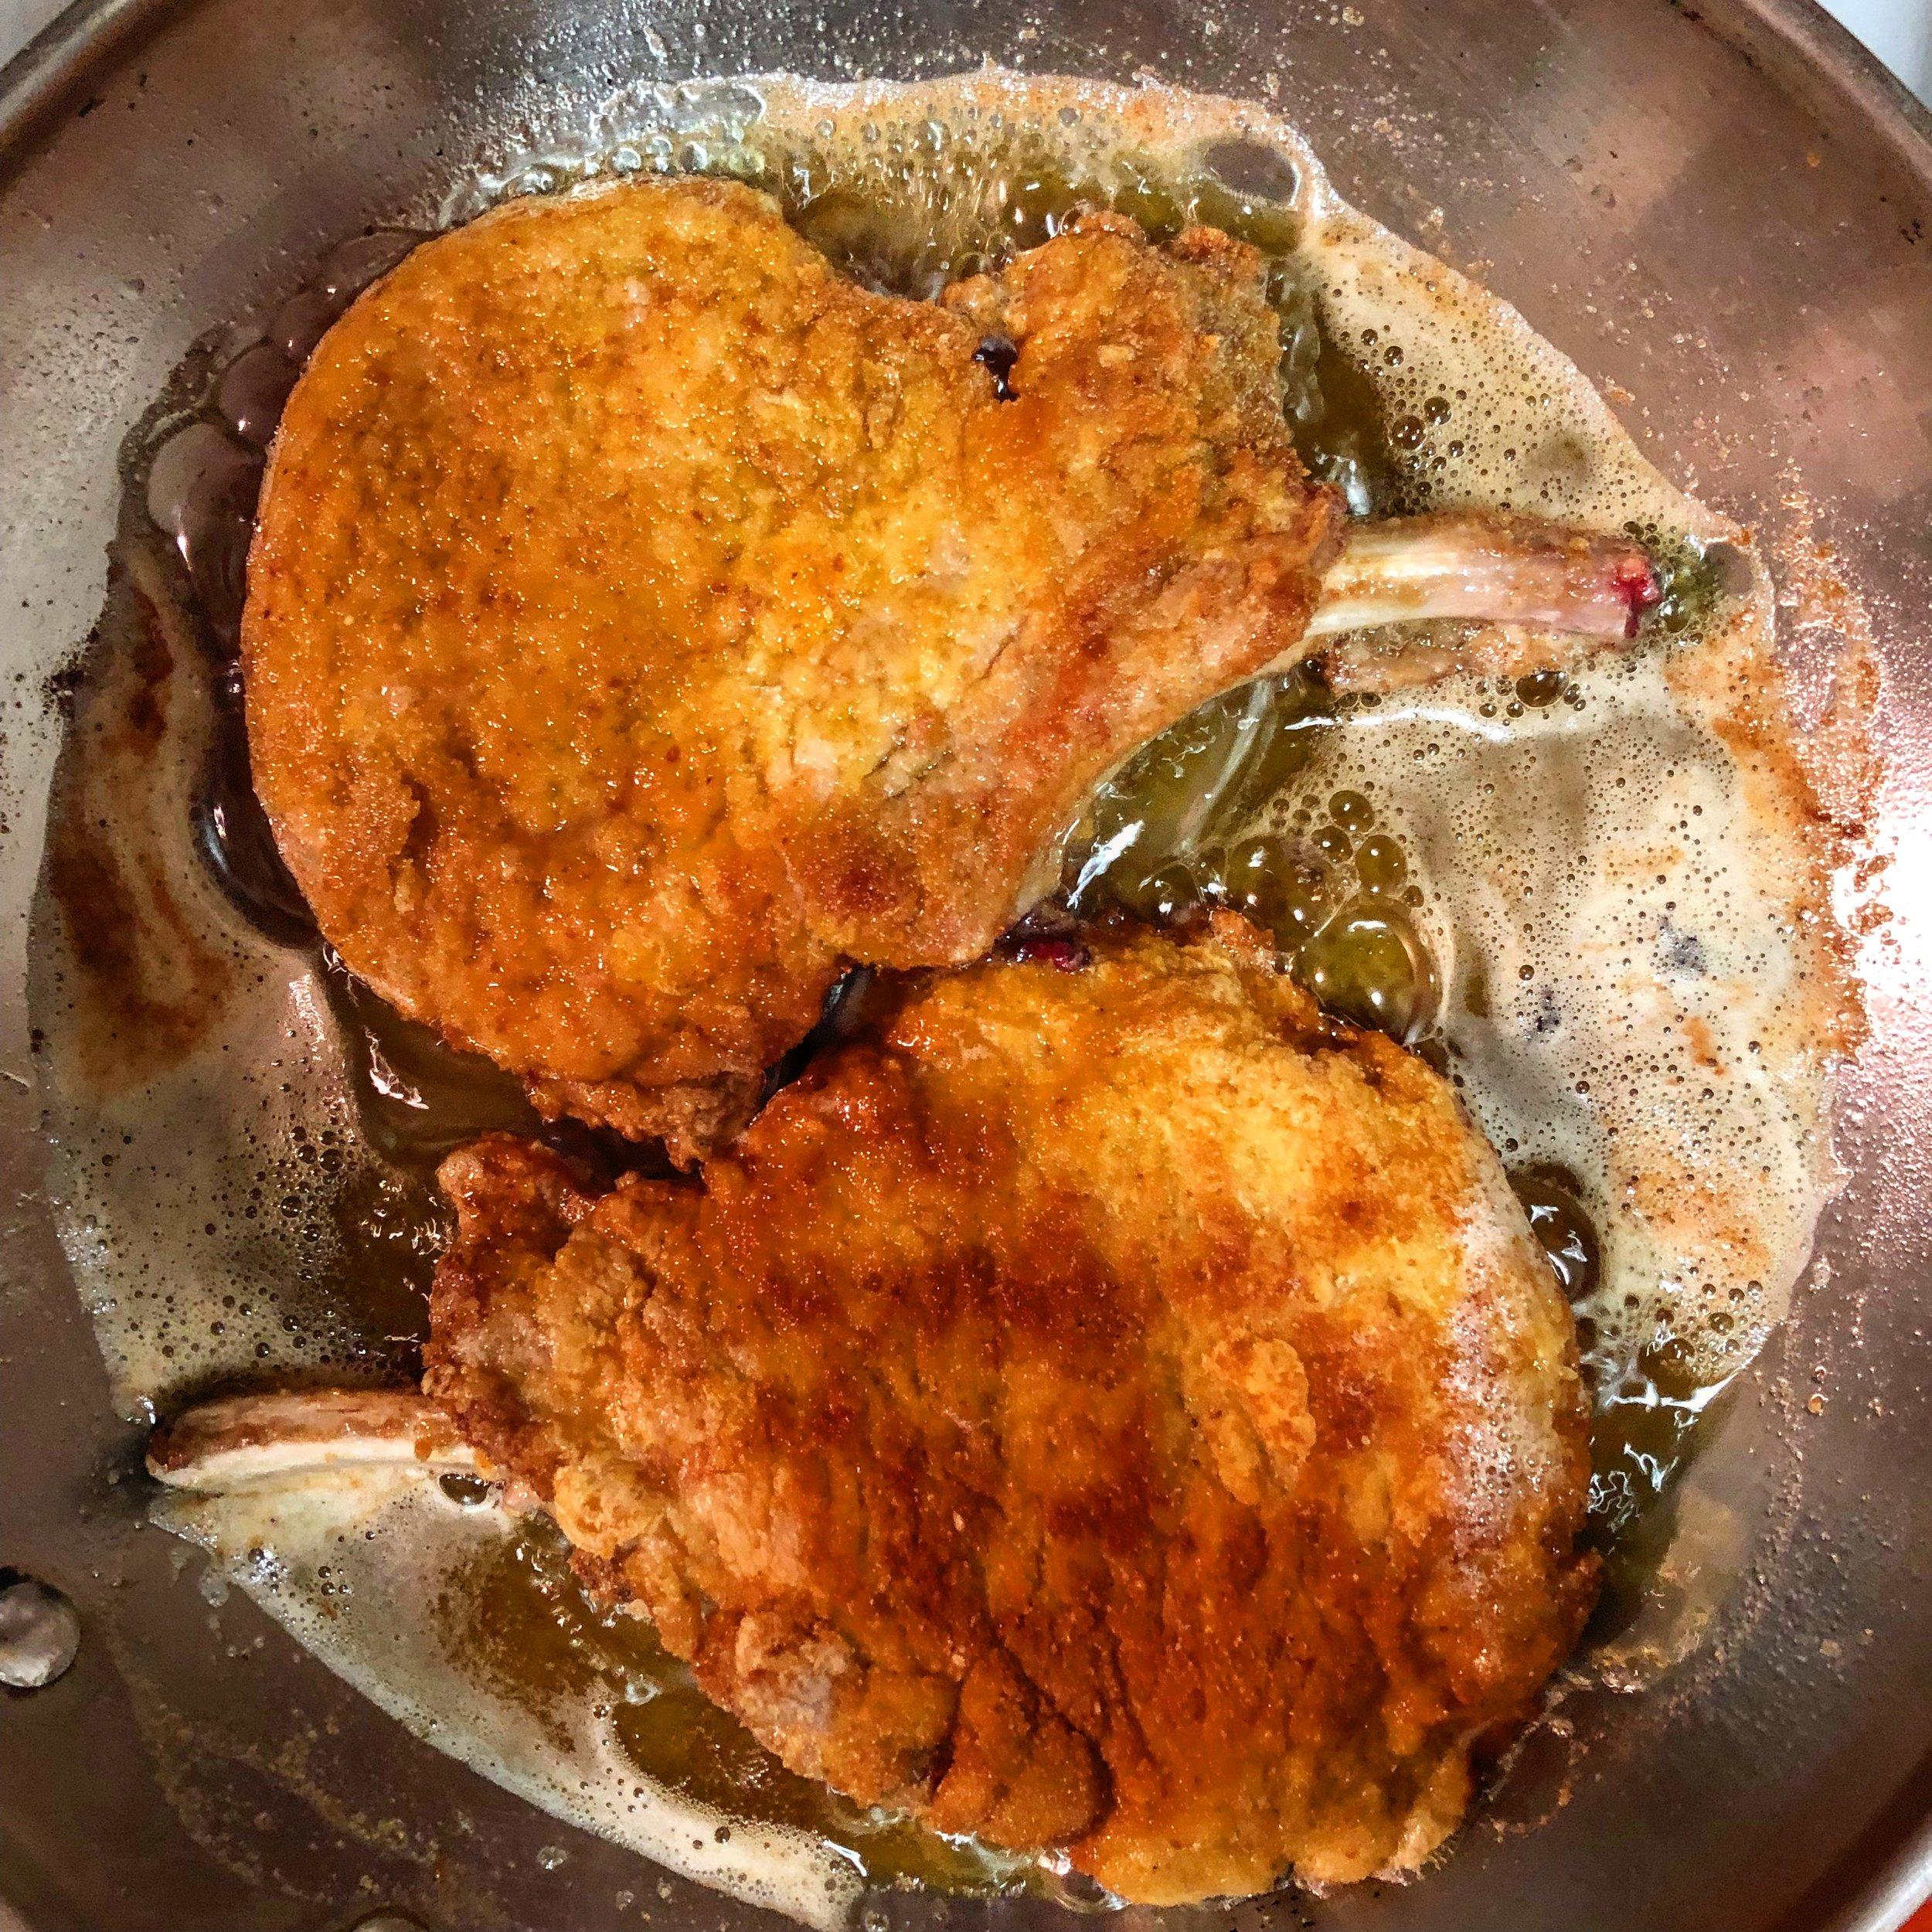 Fry the pork chops until golden brown on both sides, then pour plain white vinegar over them.